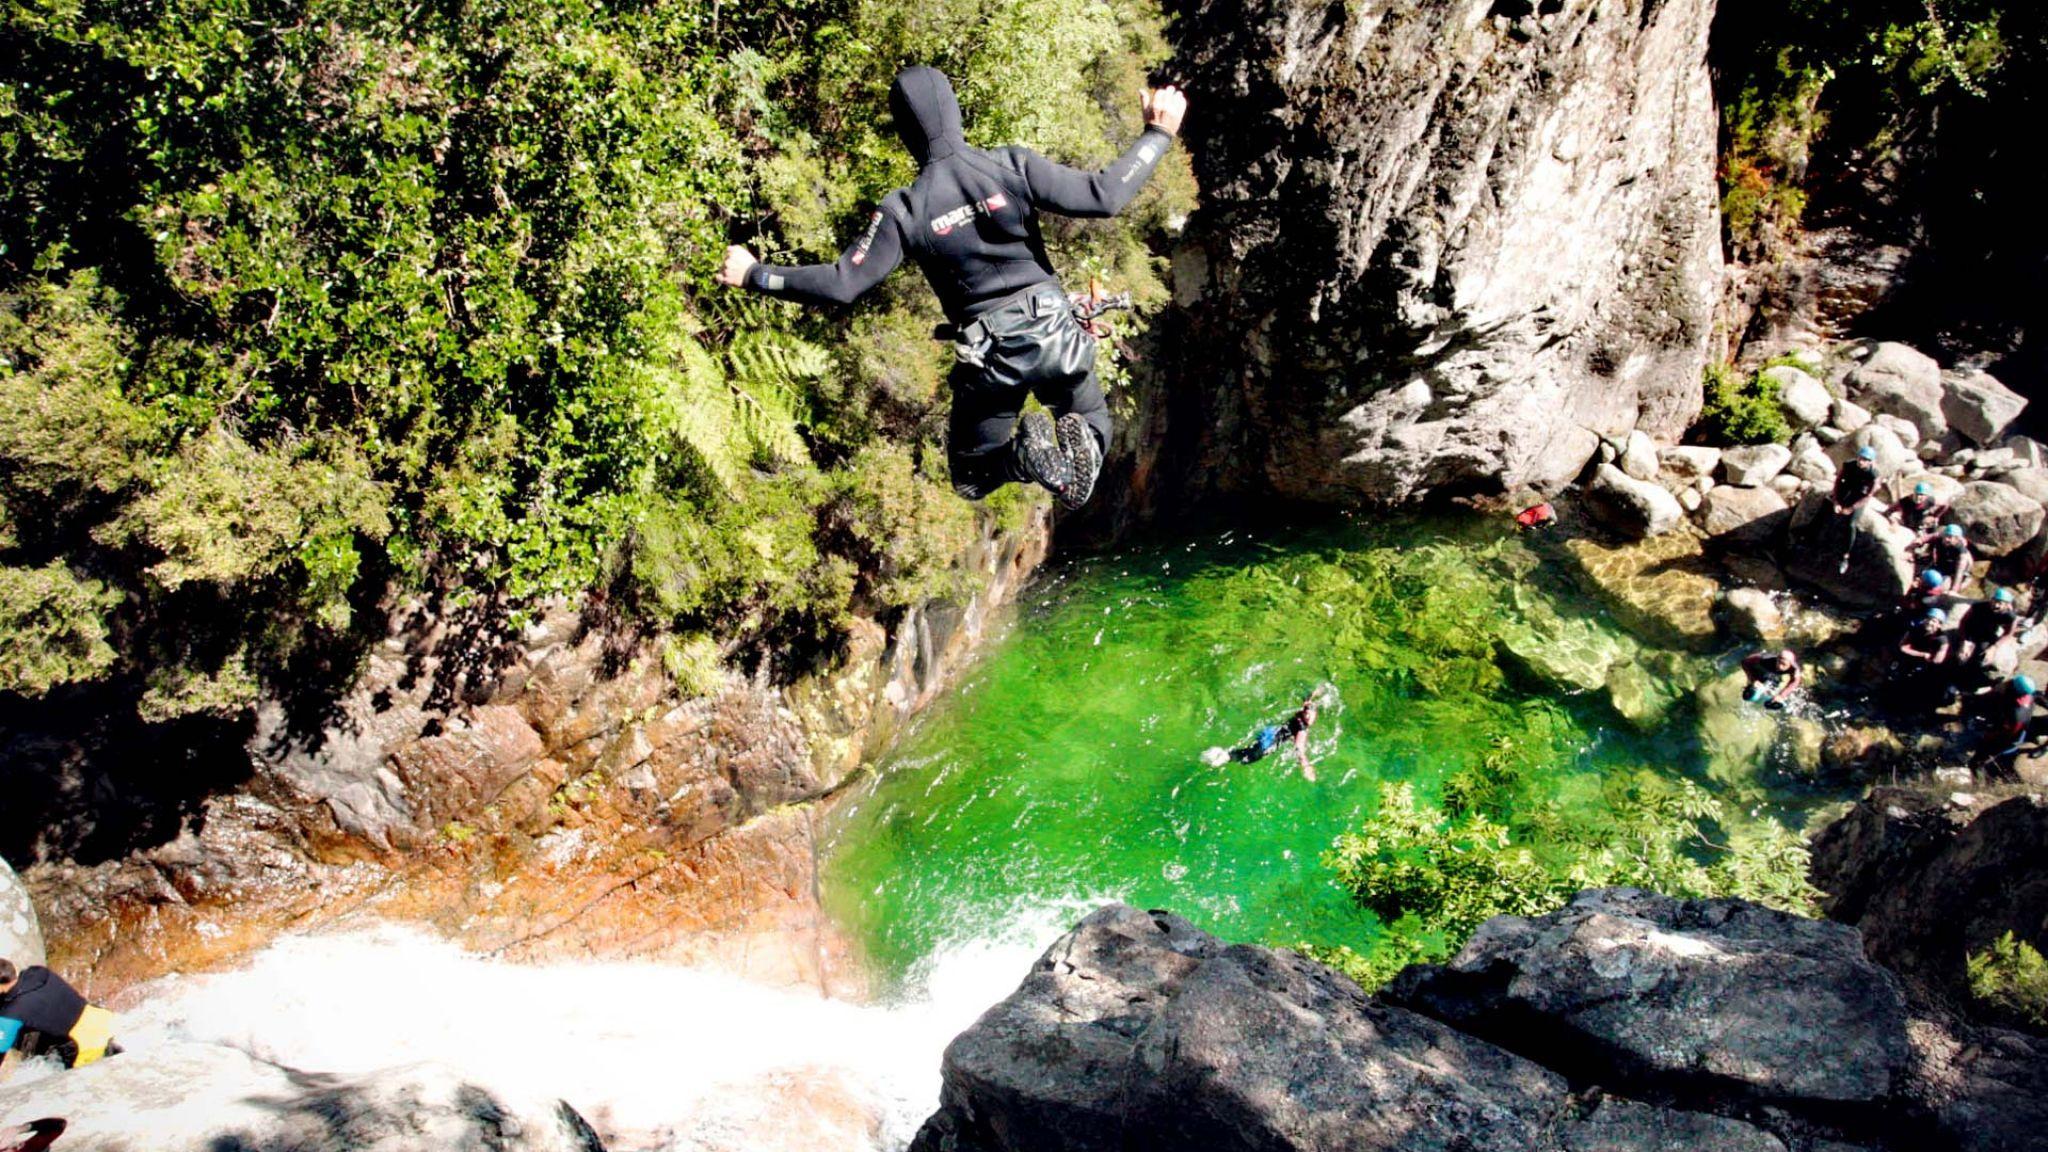 Klettergurt Canyoning : Canyon pulischellu canyons in korsika bavella